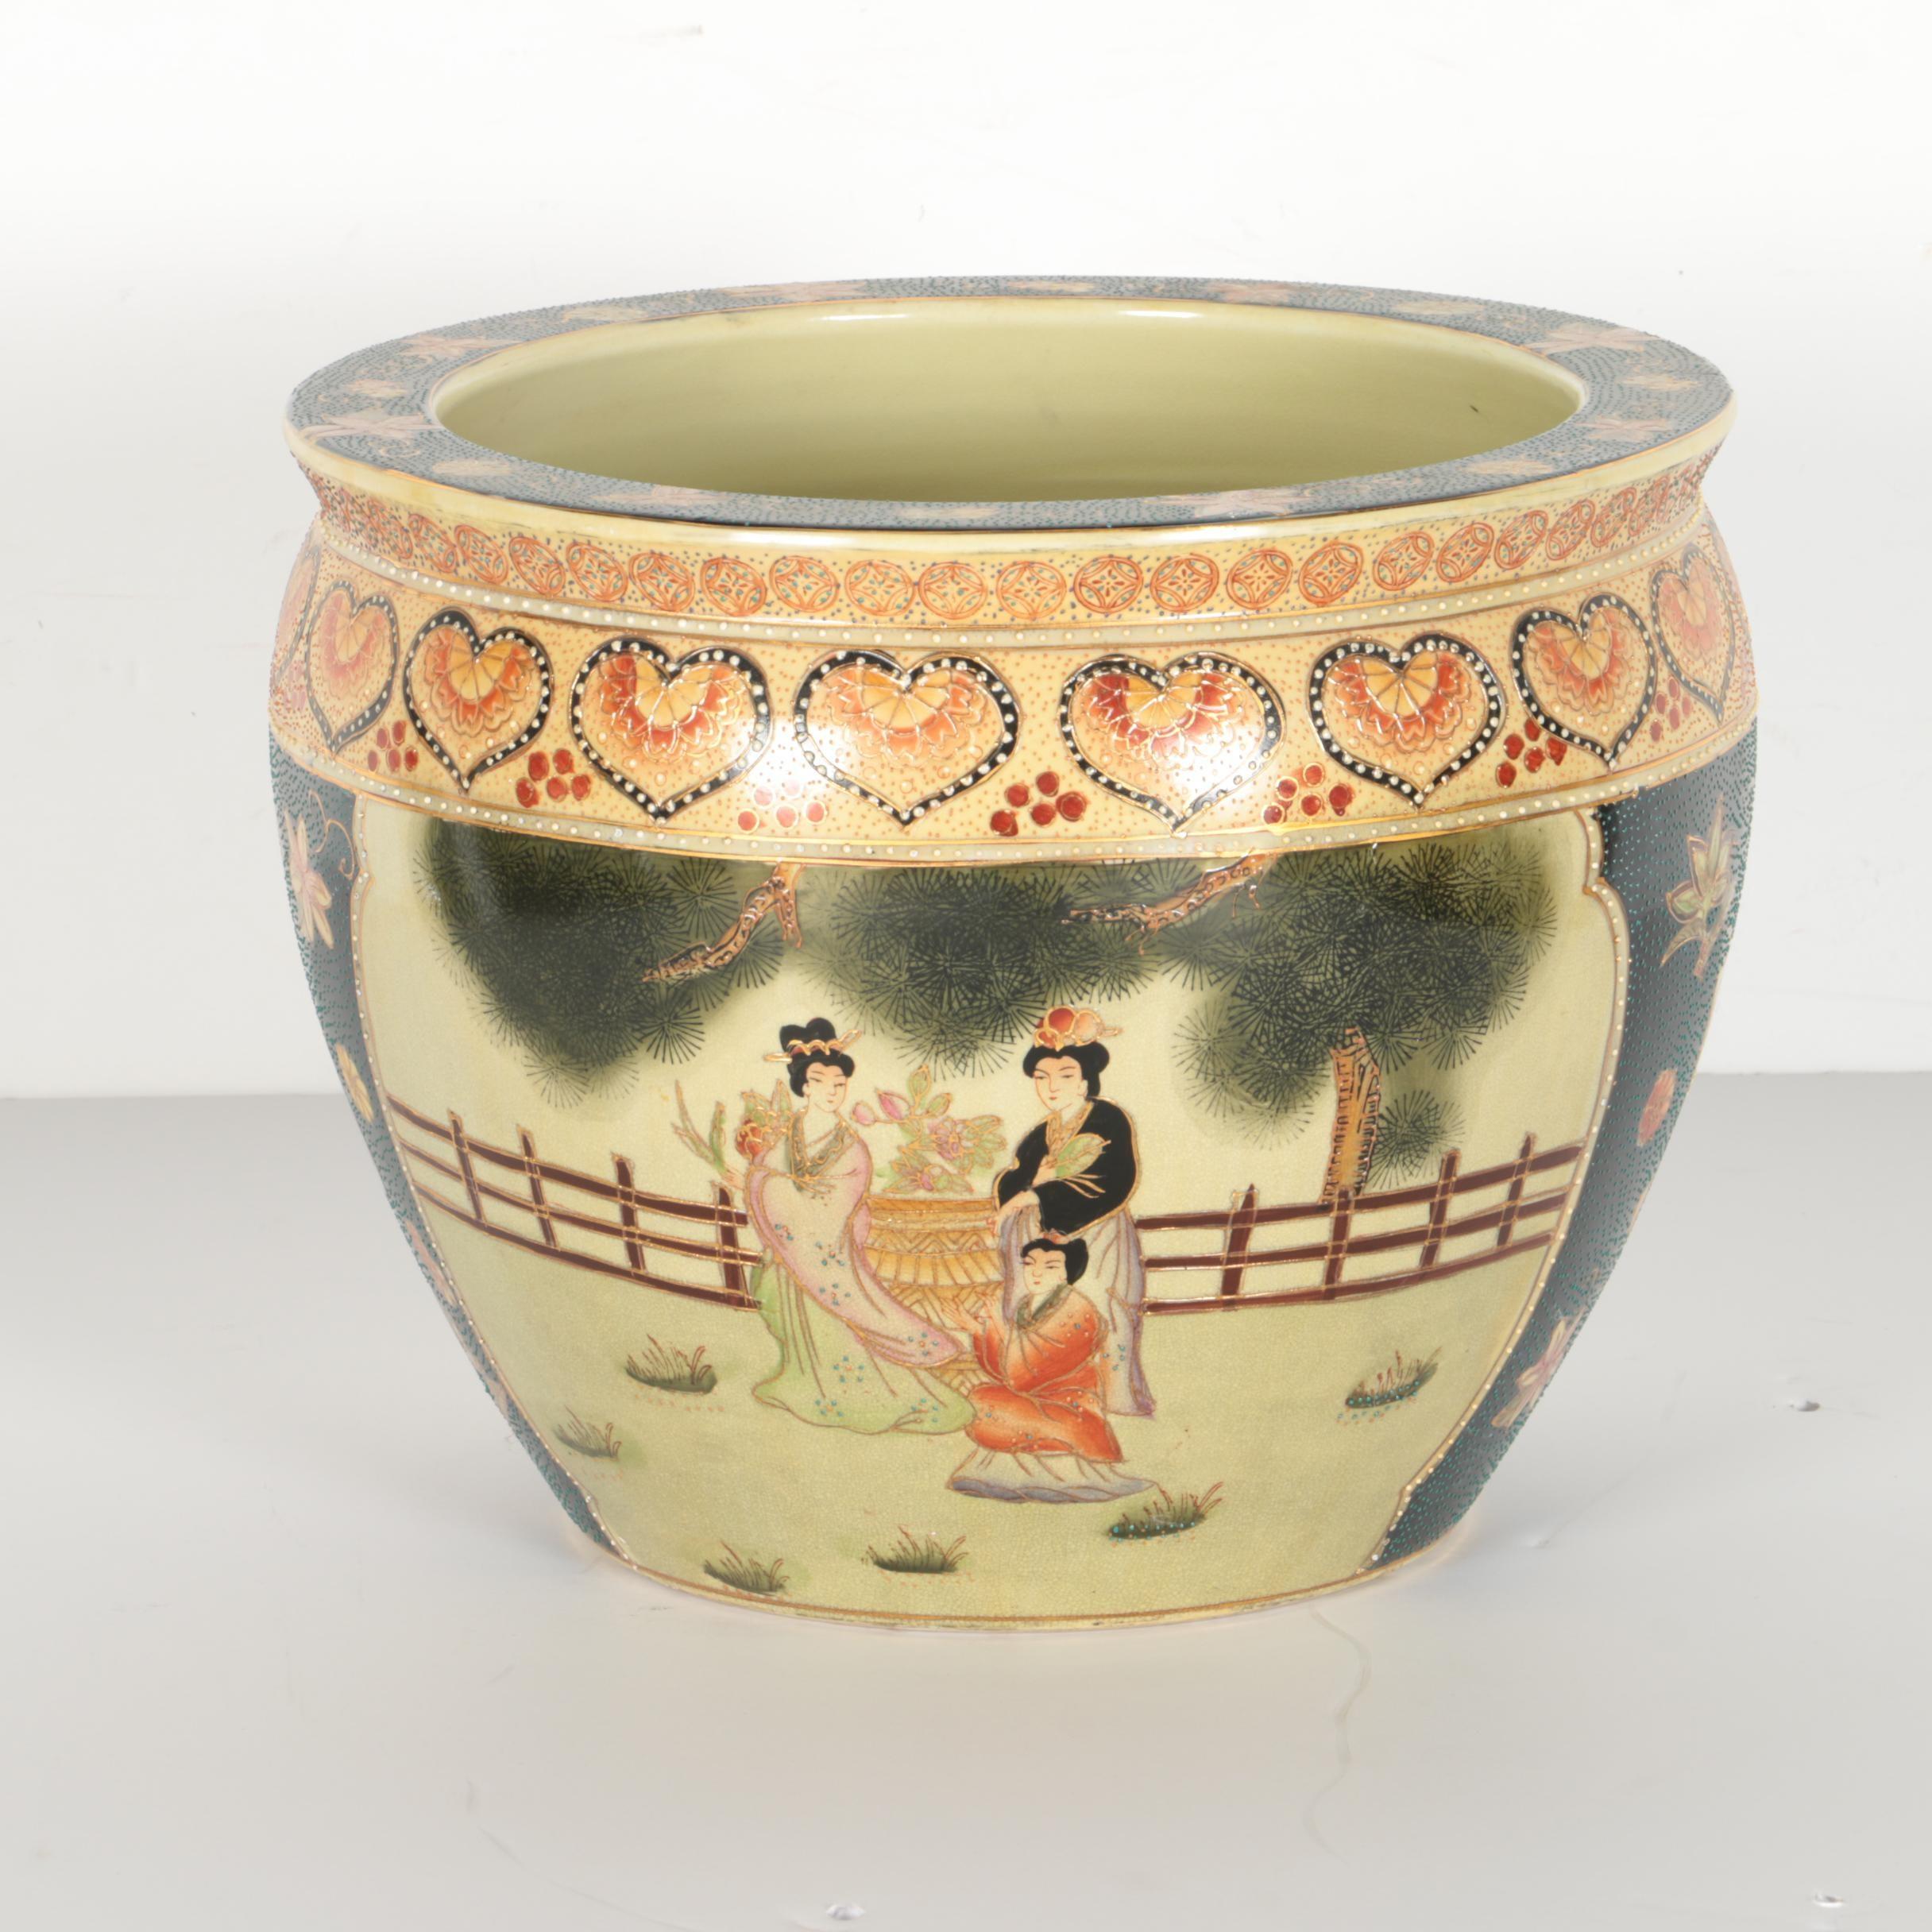 Chinese Ceramic Fish Bowl Planter